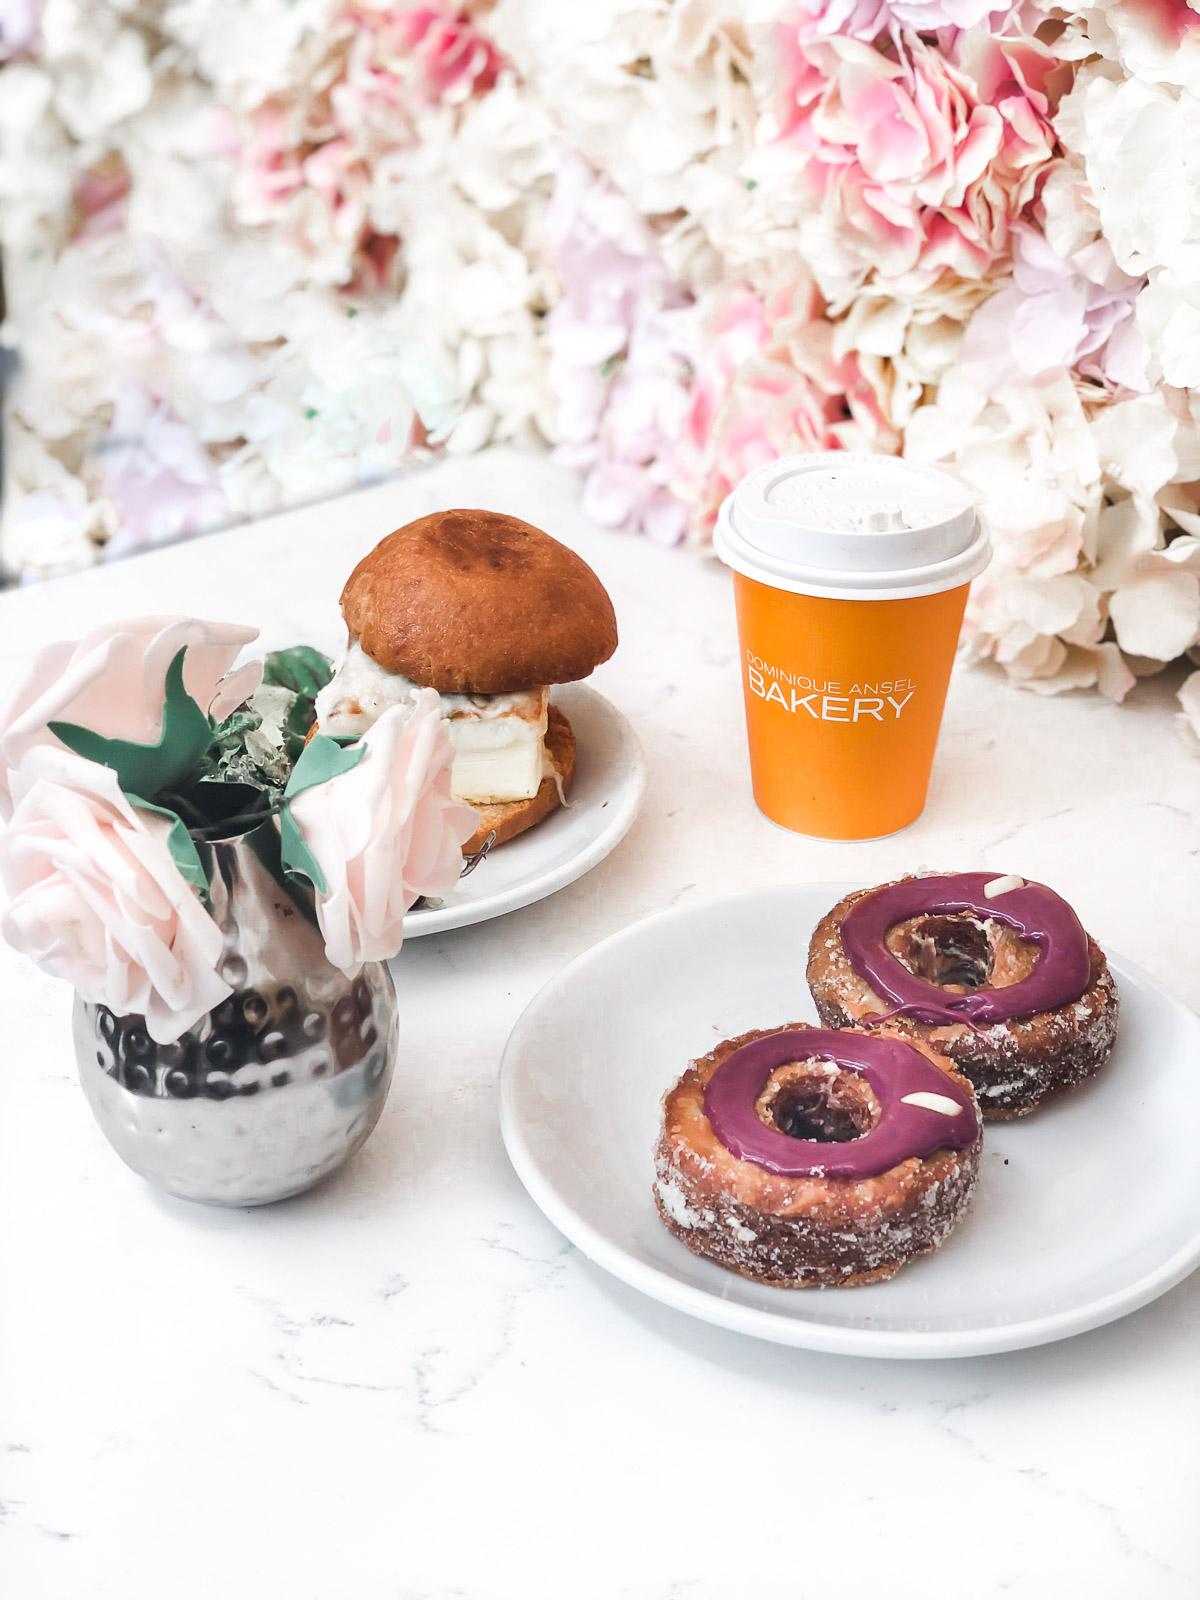 dominique ansel bakery cronut